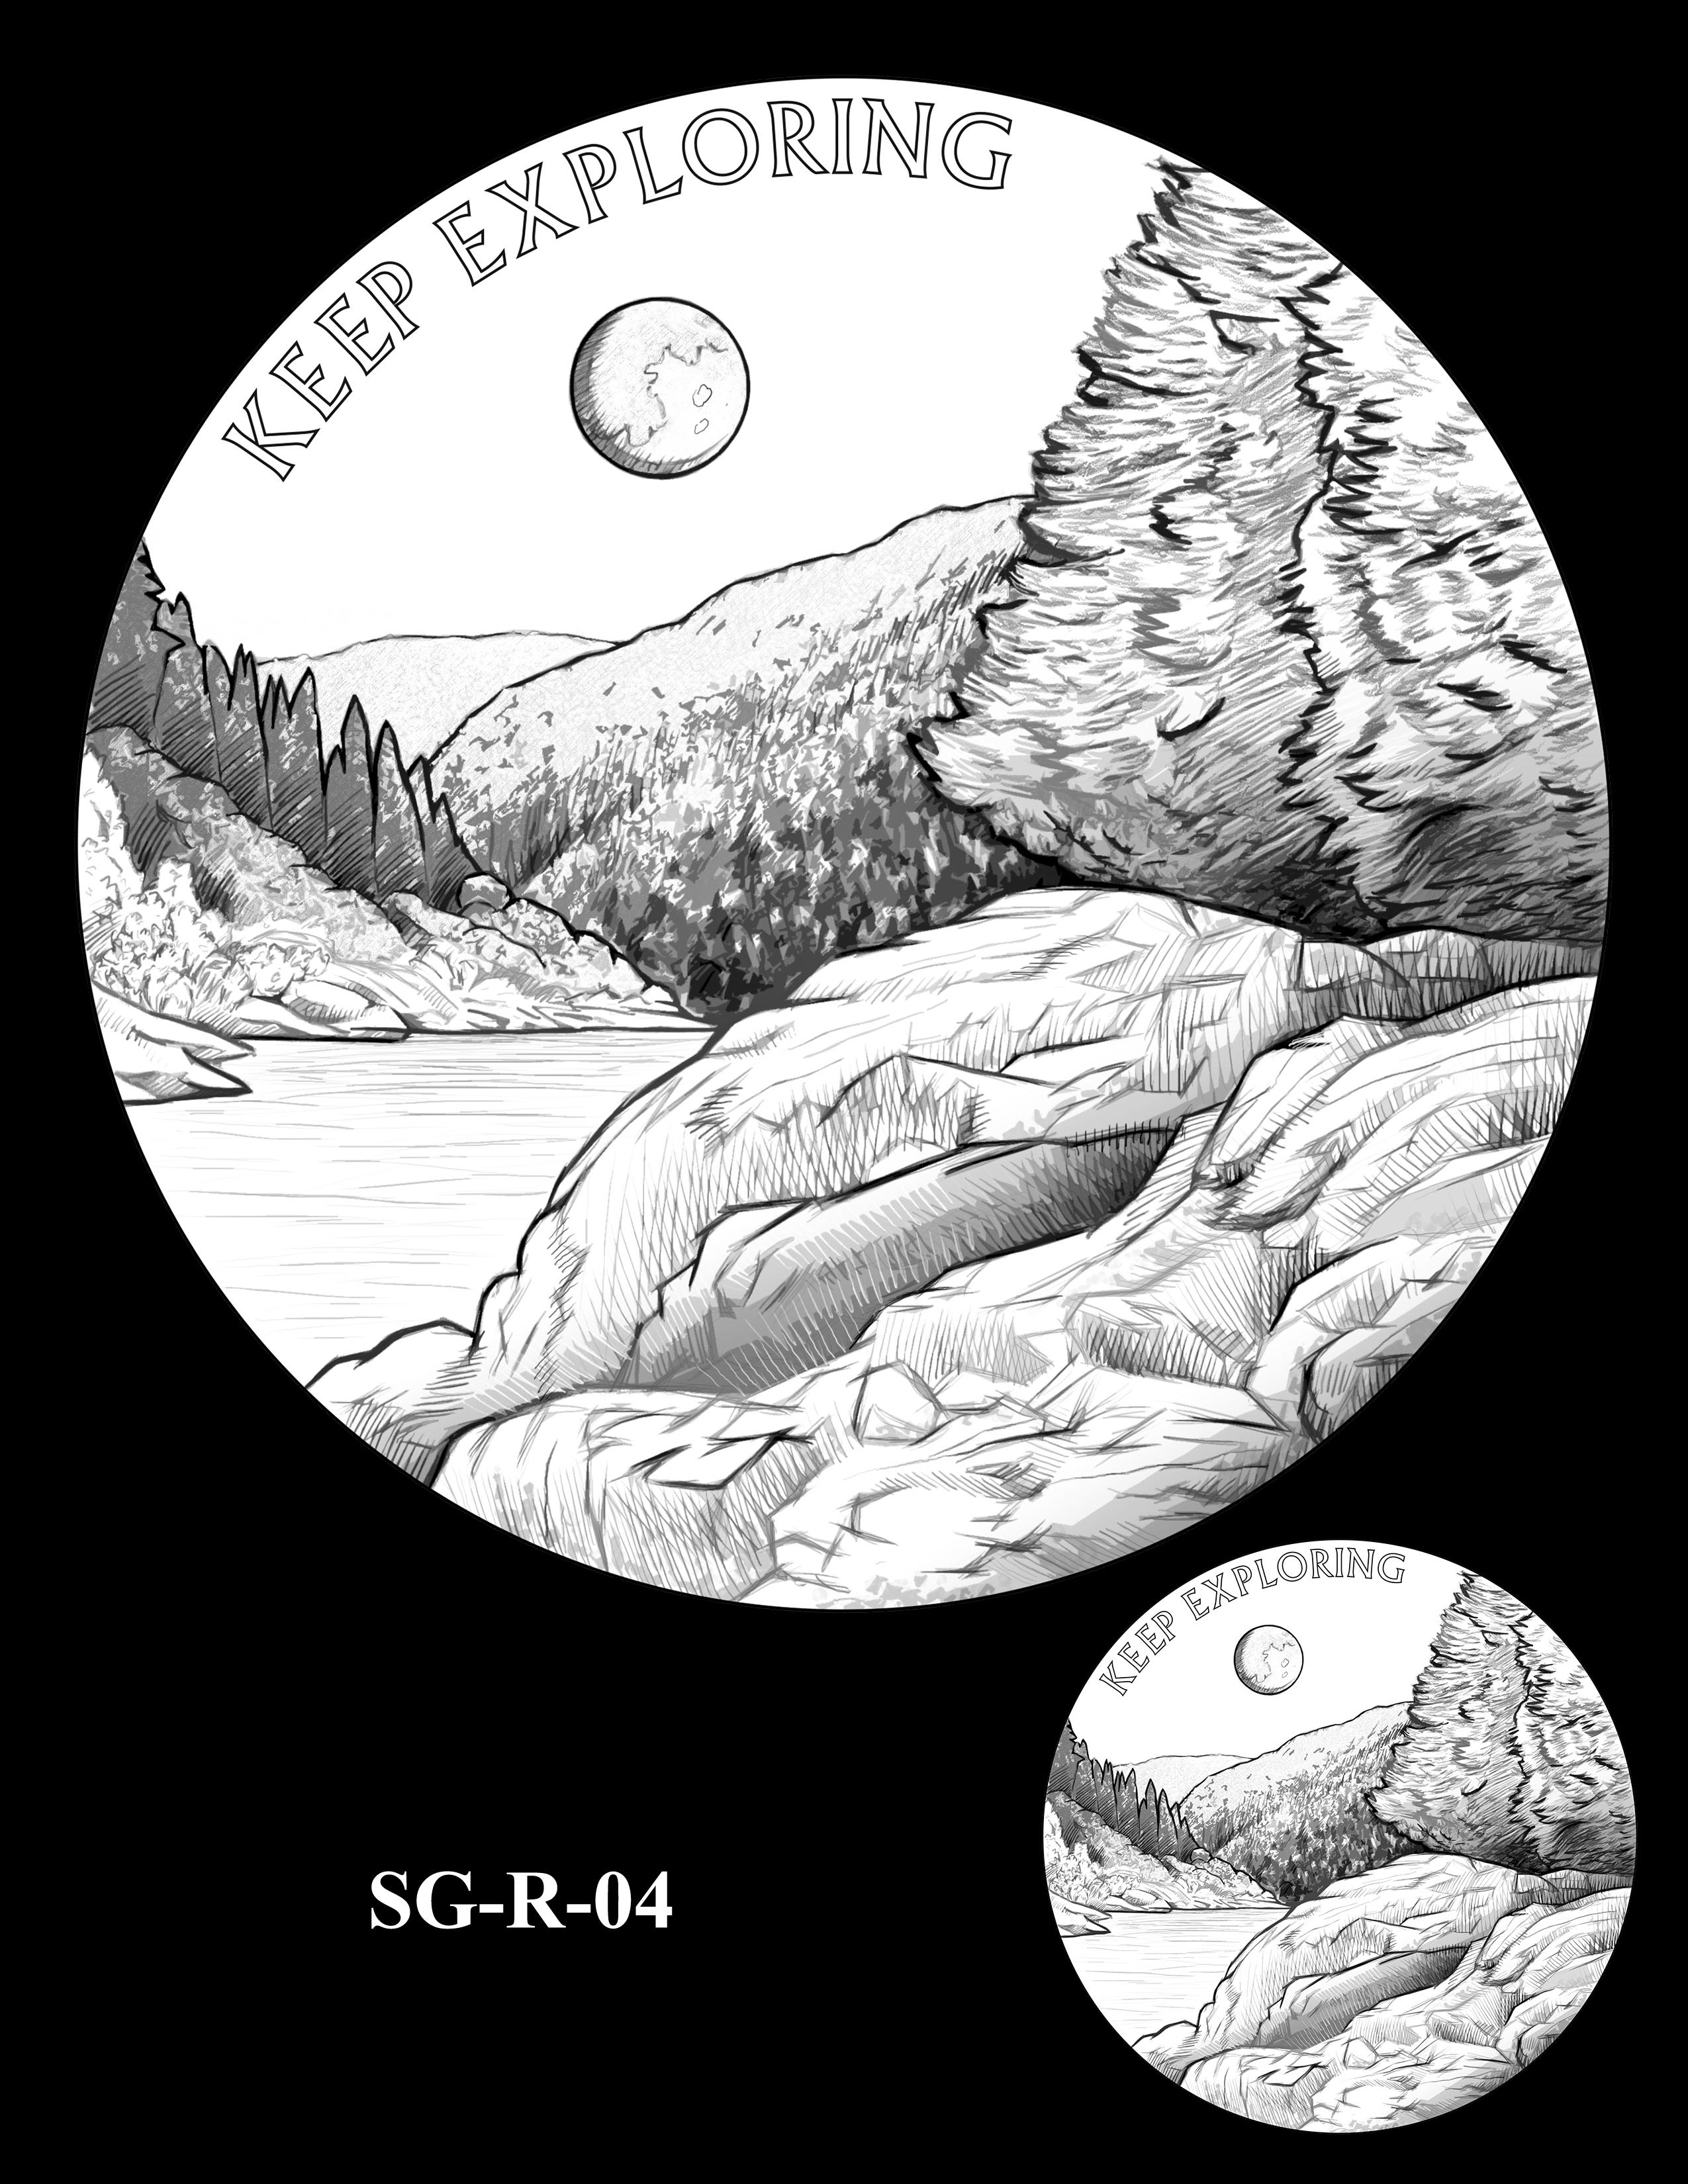 SG-R-04 -- Steve Gleason CGM Reverse